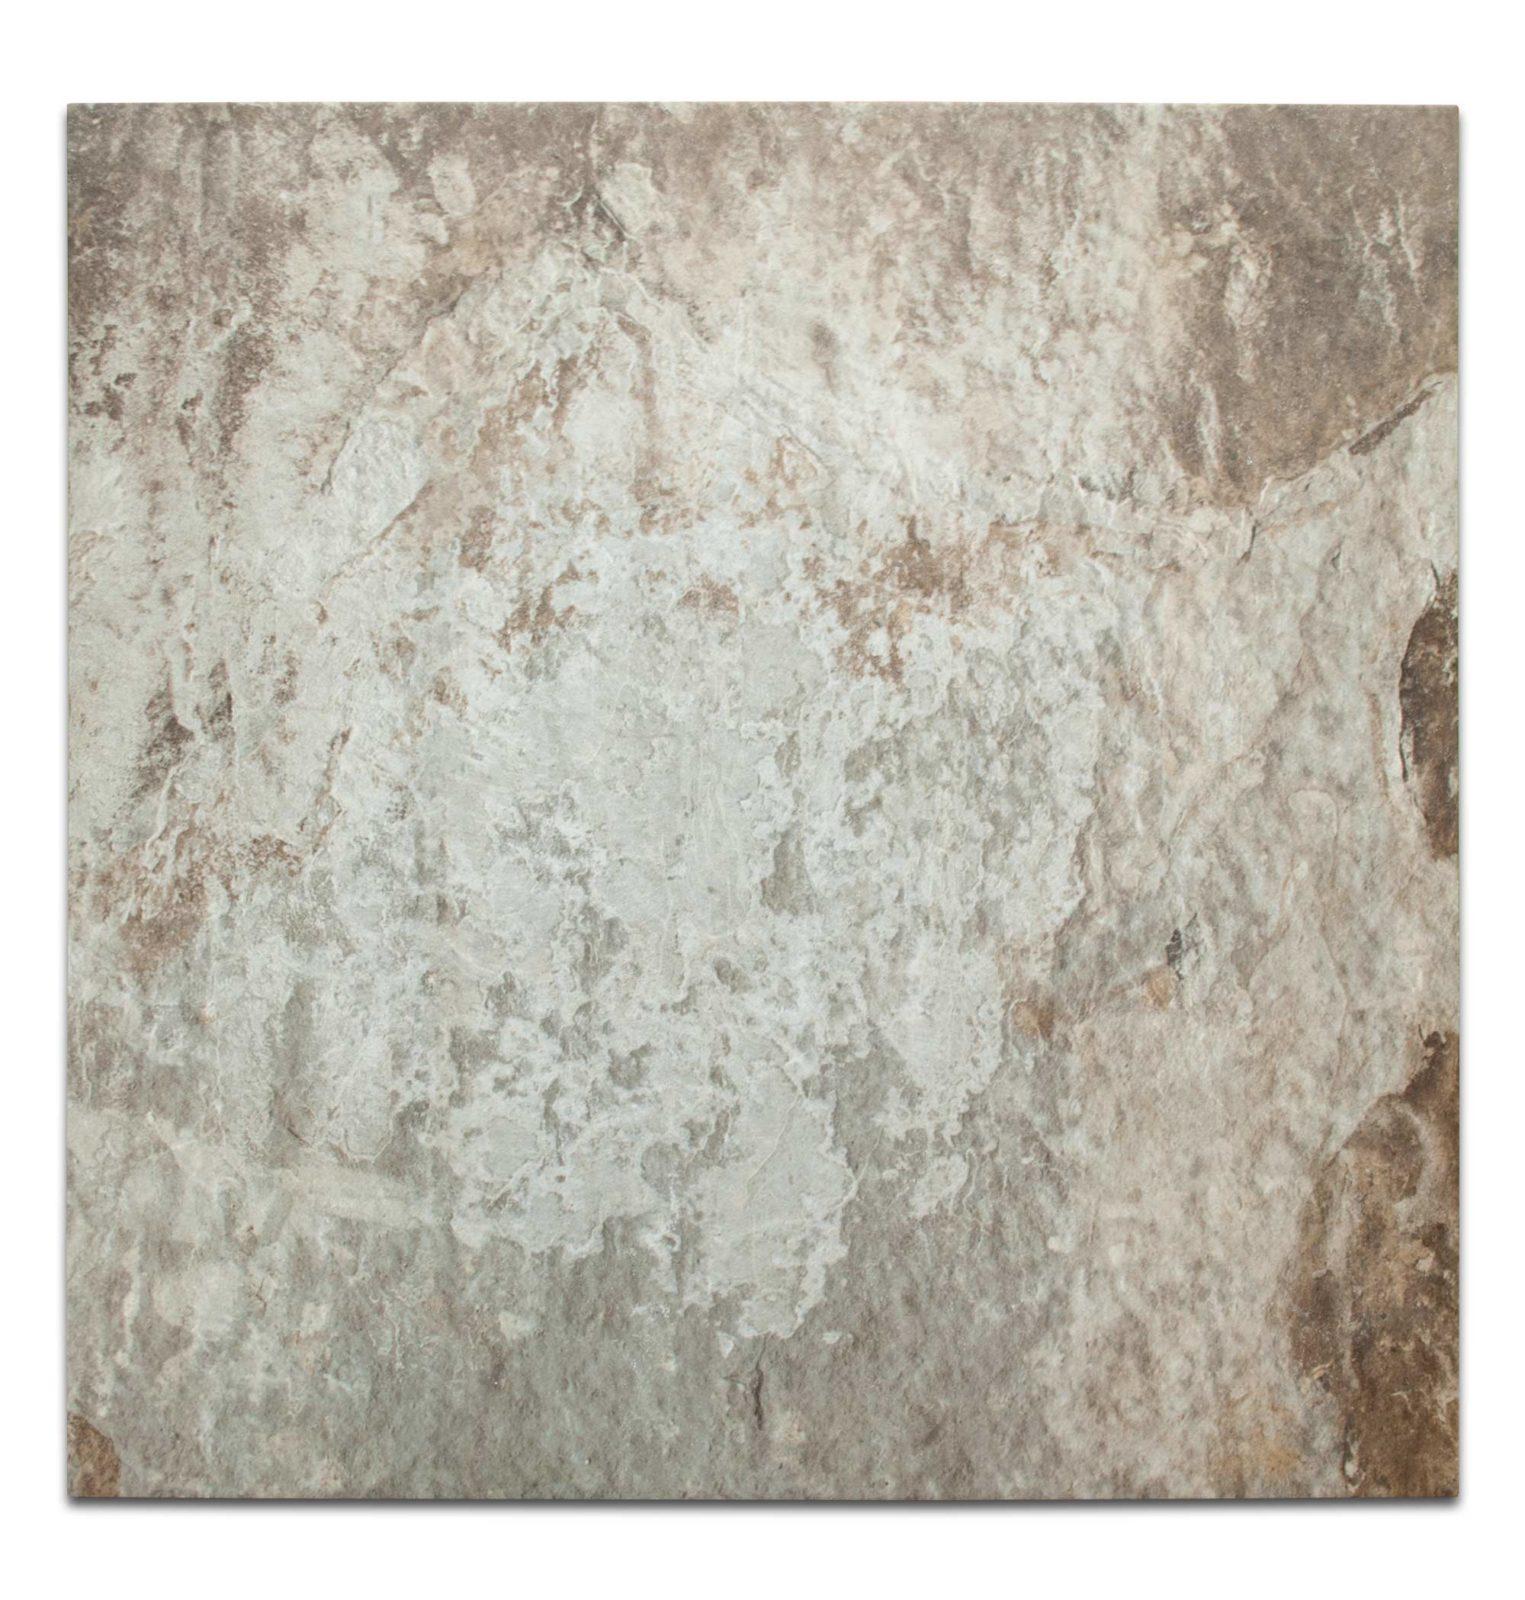 Vintage cleft carlsbad beige tile 20 x 20 schillings vintage cleft carlsbad beige mohawk porcelain floor tile doublecrazyfo Image collections